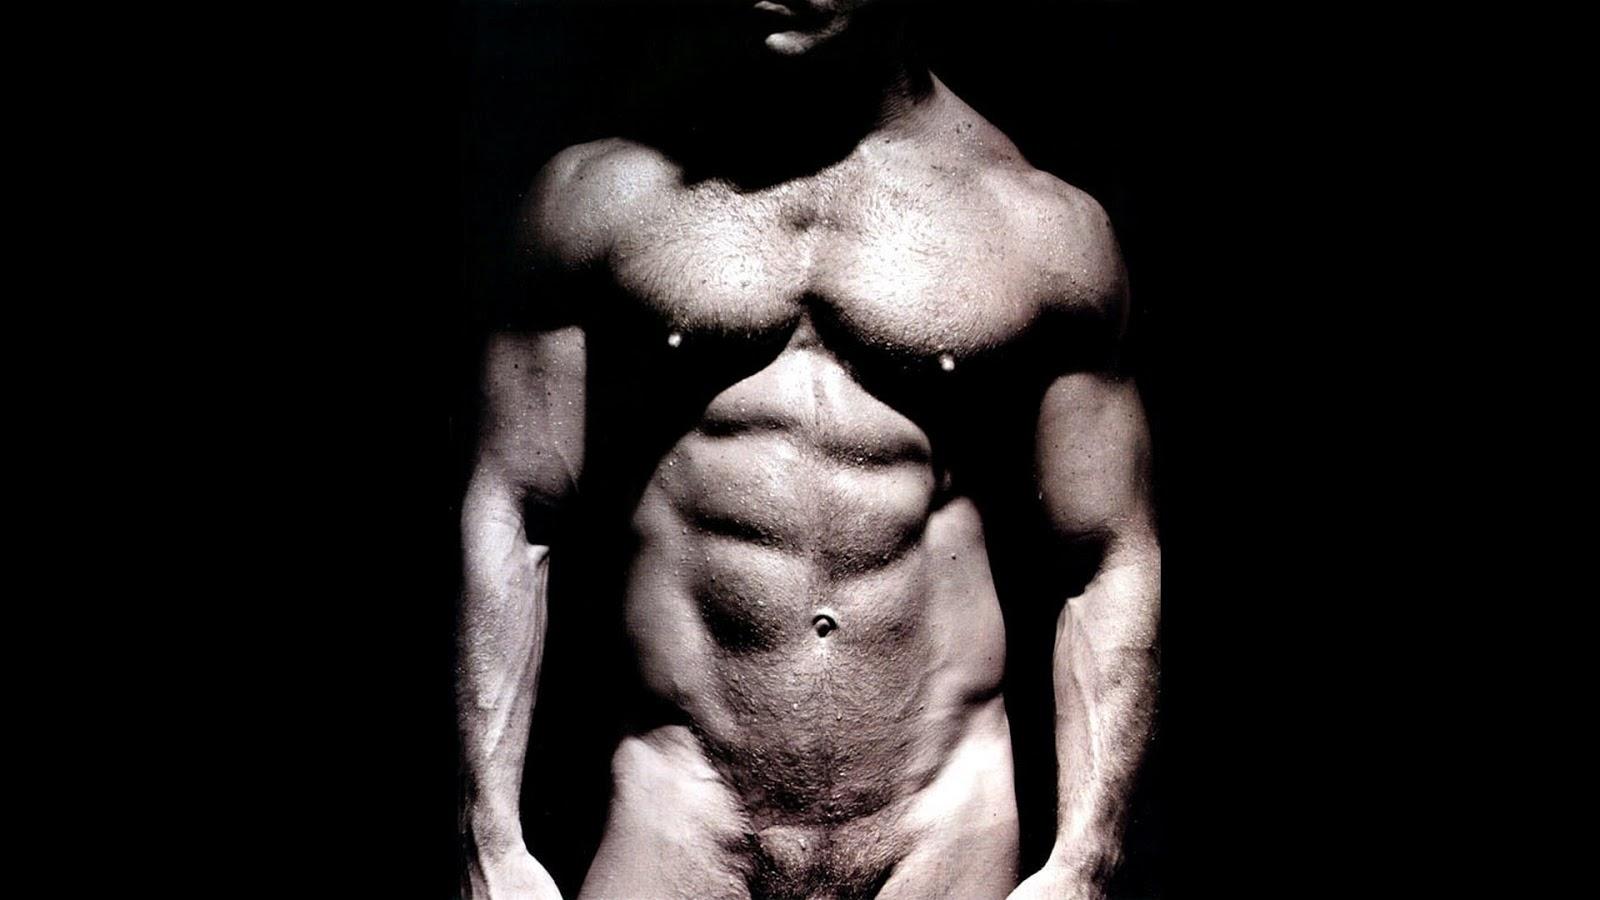 Фото мужчины в сексе 12 фотография